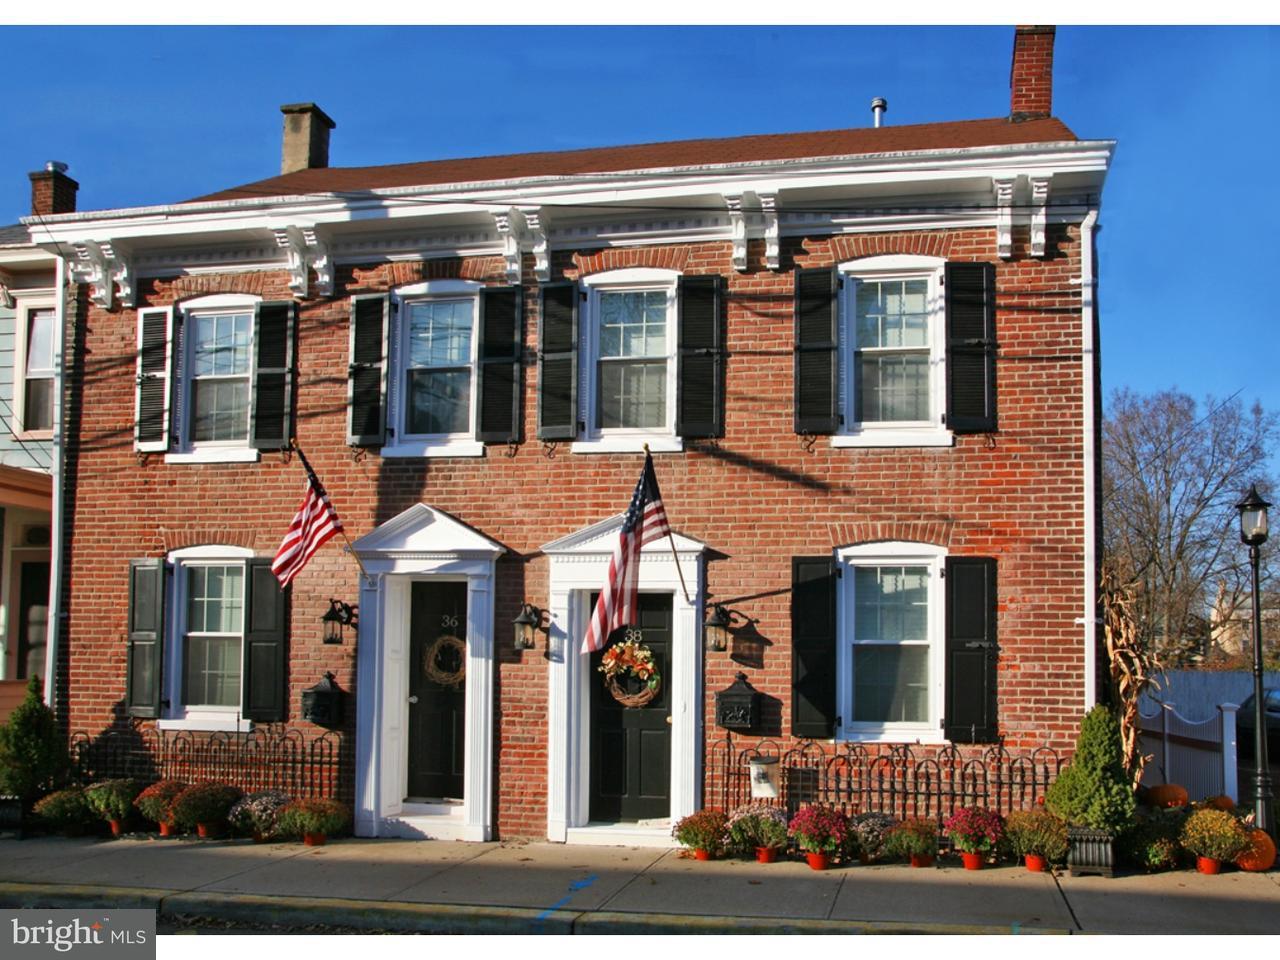 Townhouse for Sale at 38 SWAN Street Lambertville, New Jersey 08530 United StatesMunicipality: Lambertville